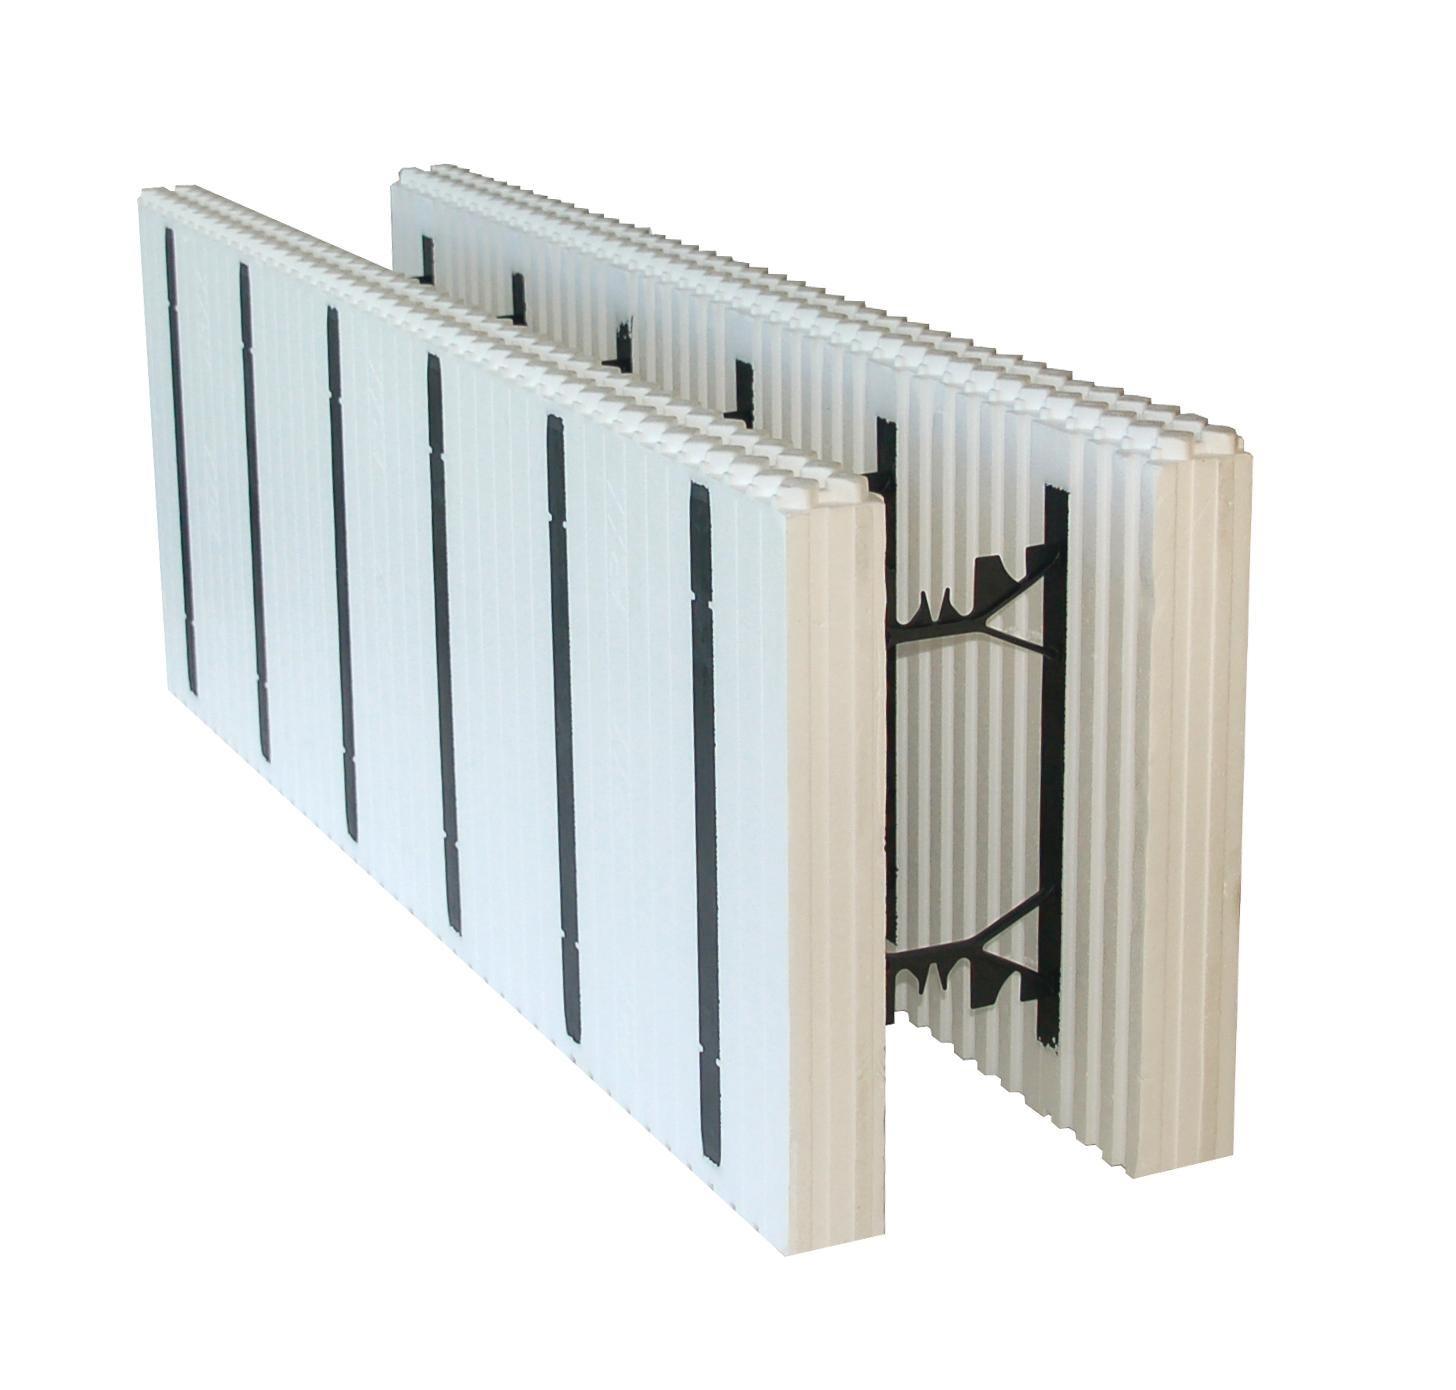 Styrofoam Basement Forms1456 X 1390